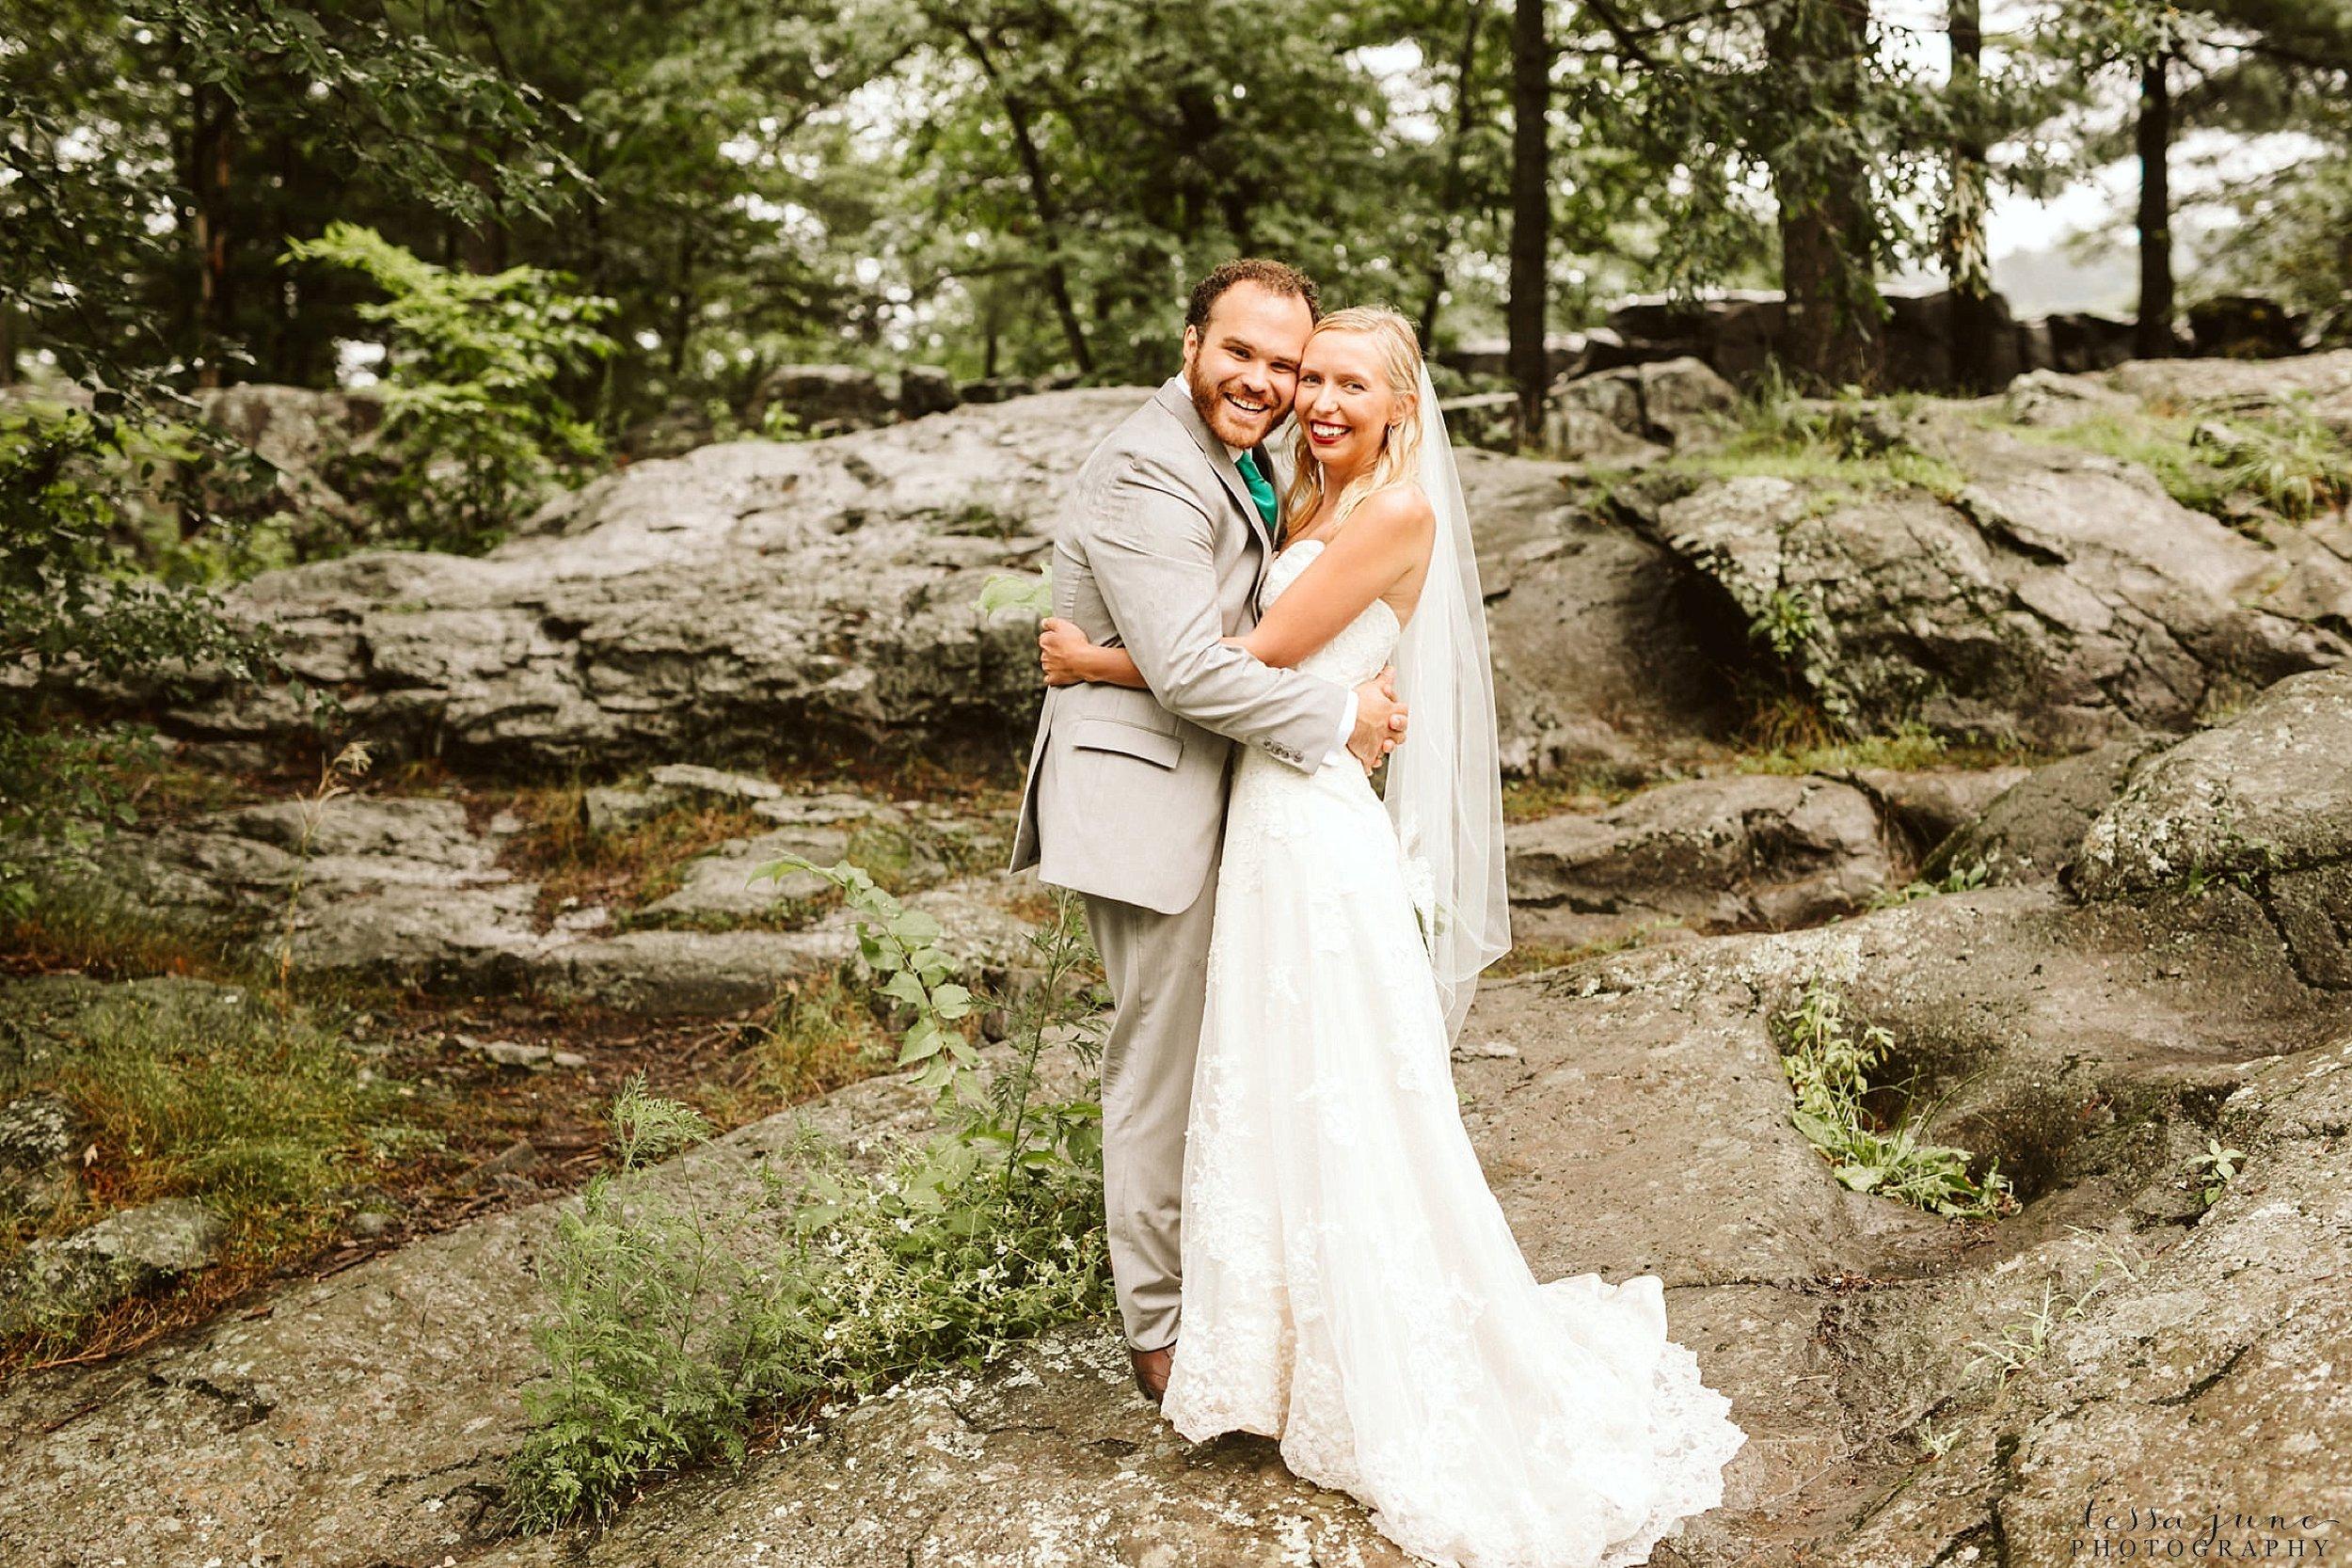 taylors-falls-rainy-elopement-wedding-interstate-state-park-87.jpg